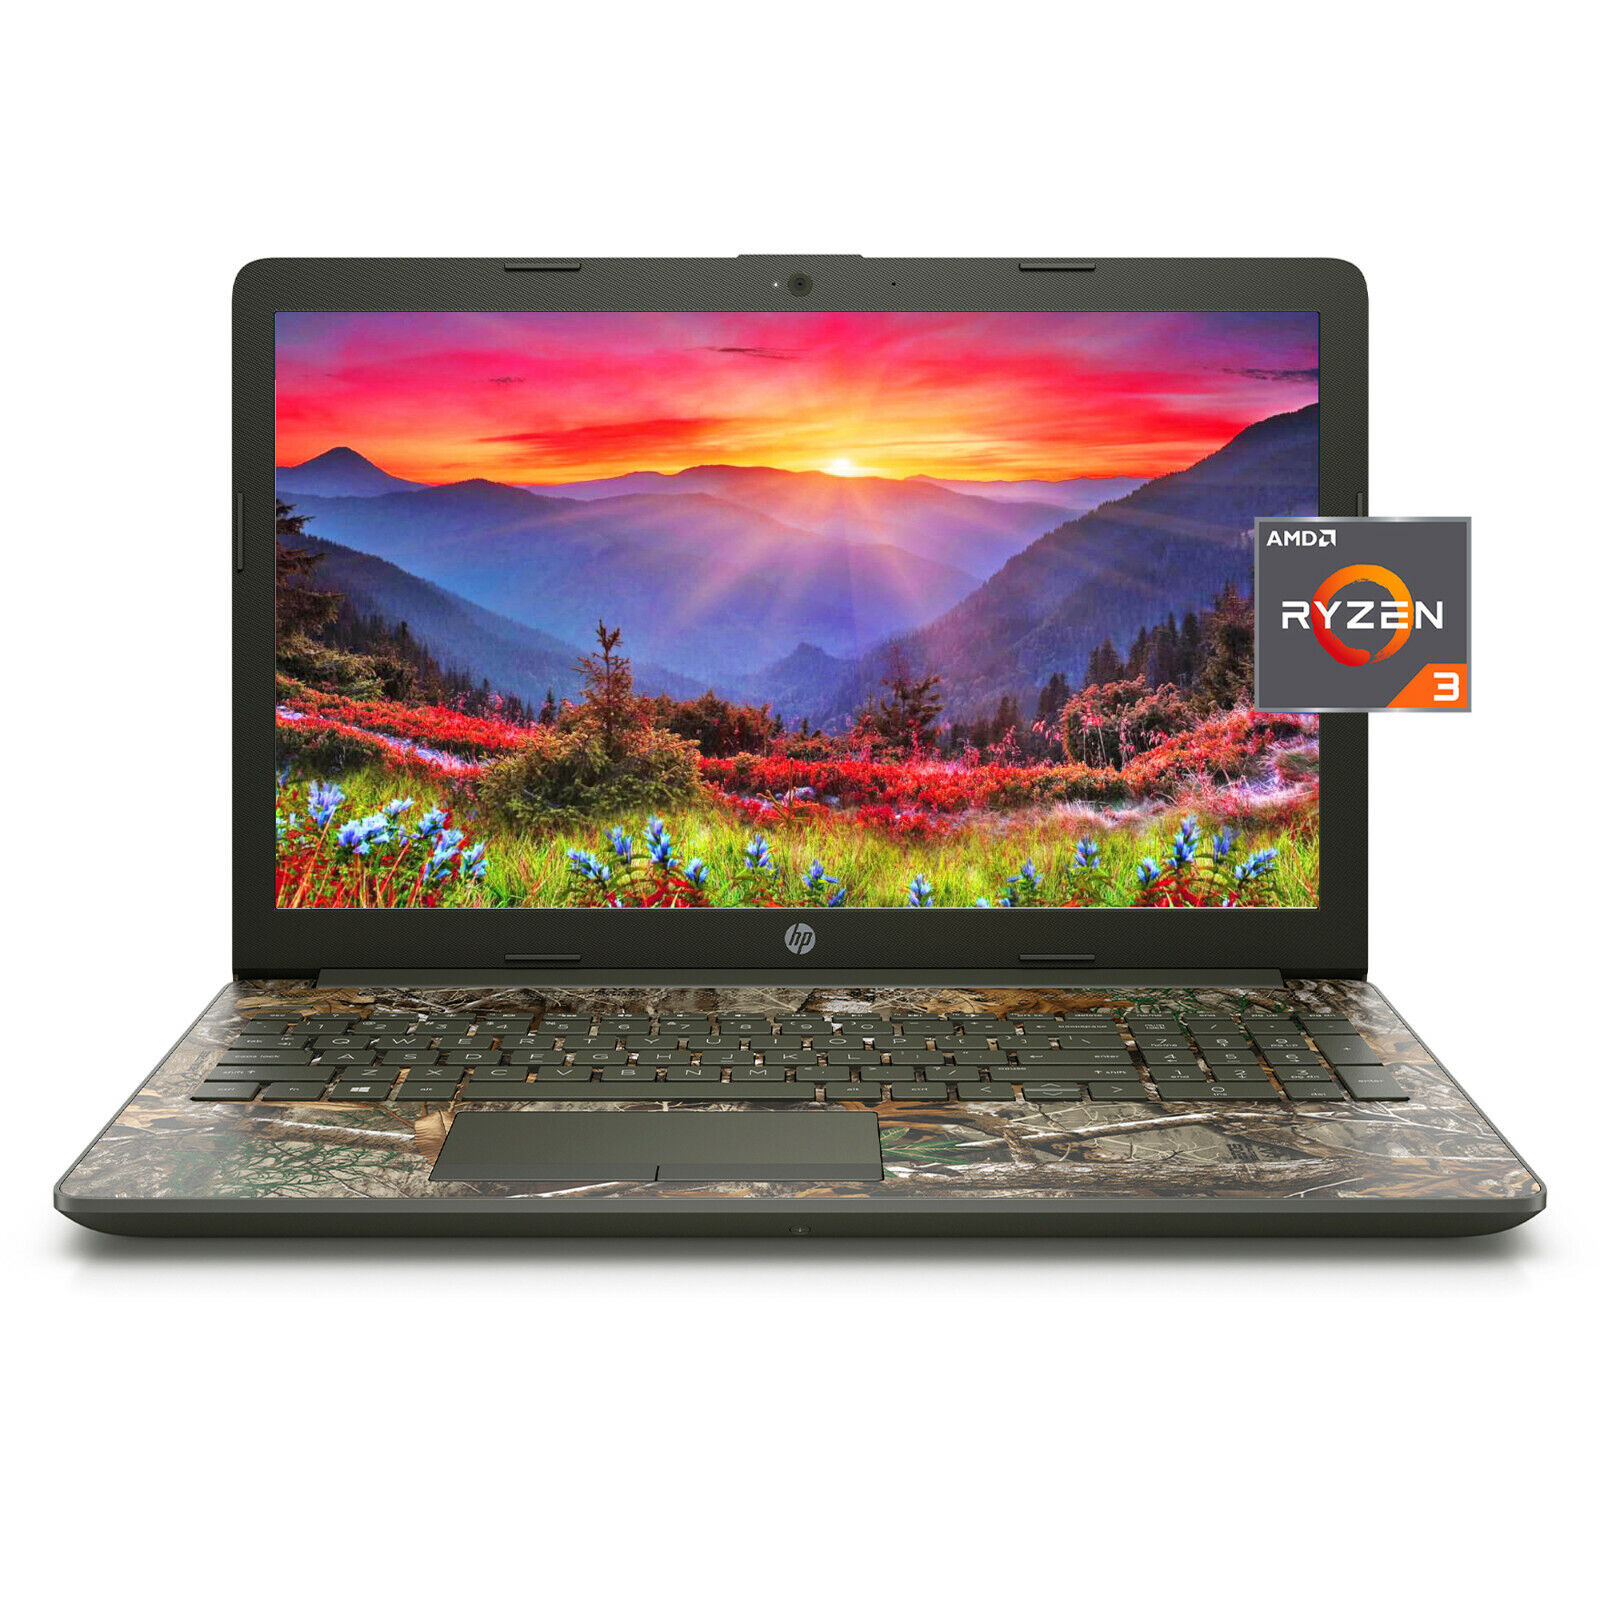 "Laptop Windows - NEW HP 15.6"" HD AMD Ryzen 3 3200U 3.5GHz 8GB 256GB SSD Windows 10 Laptop Camo"